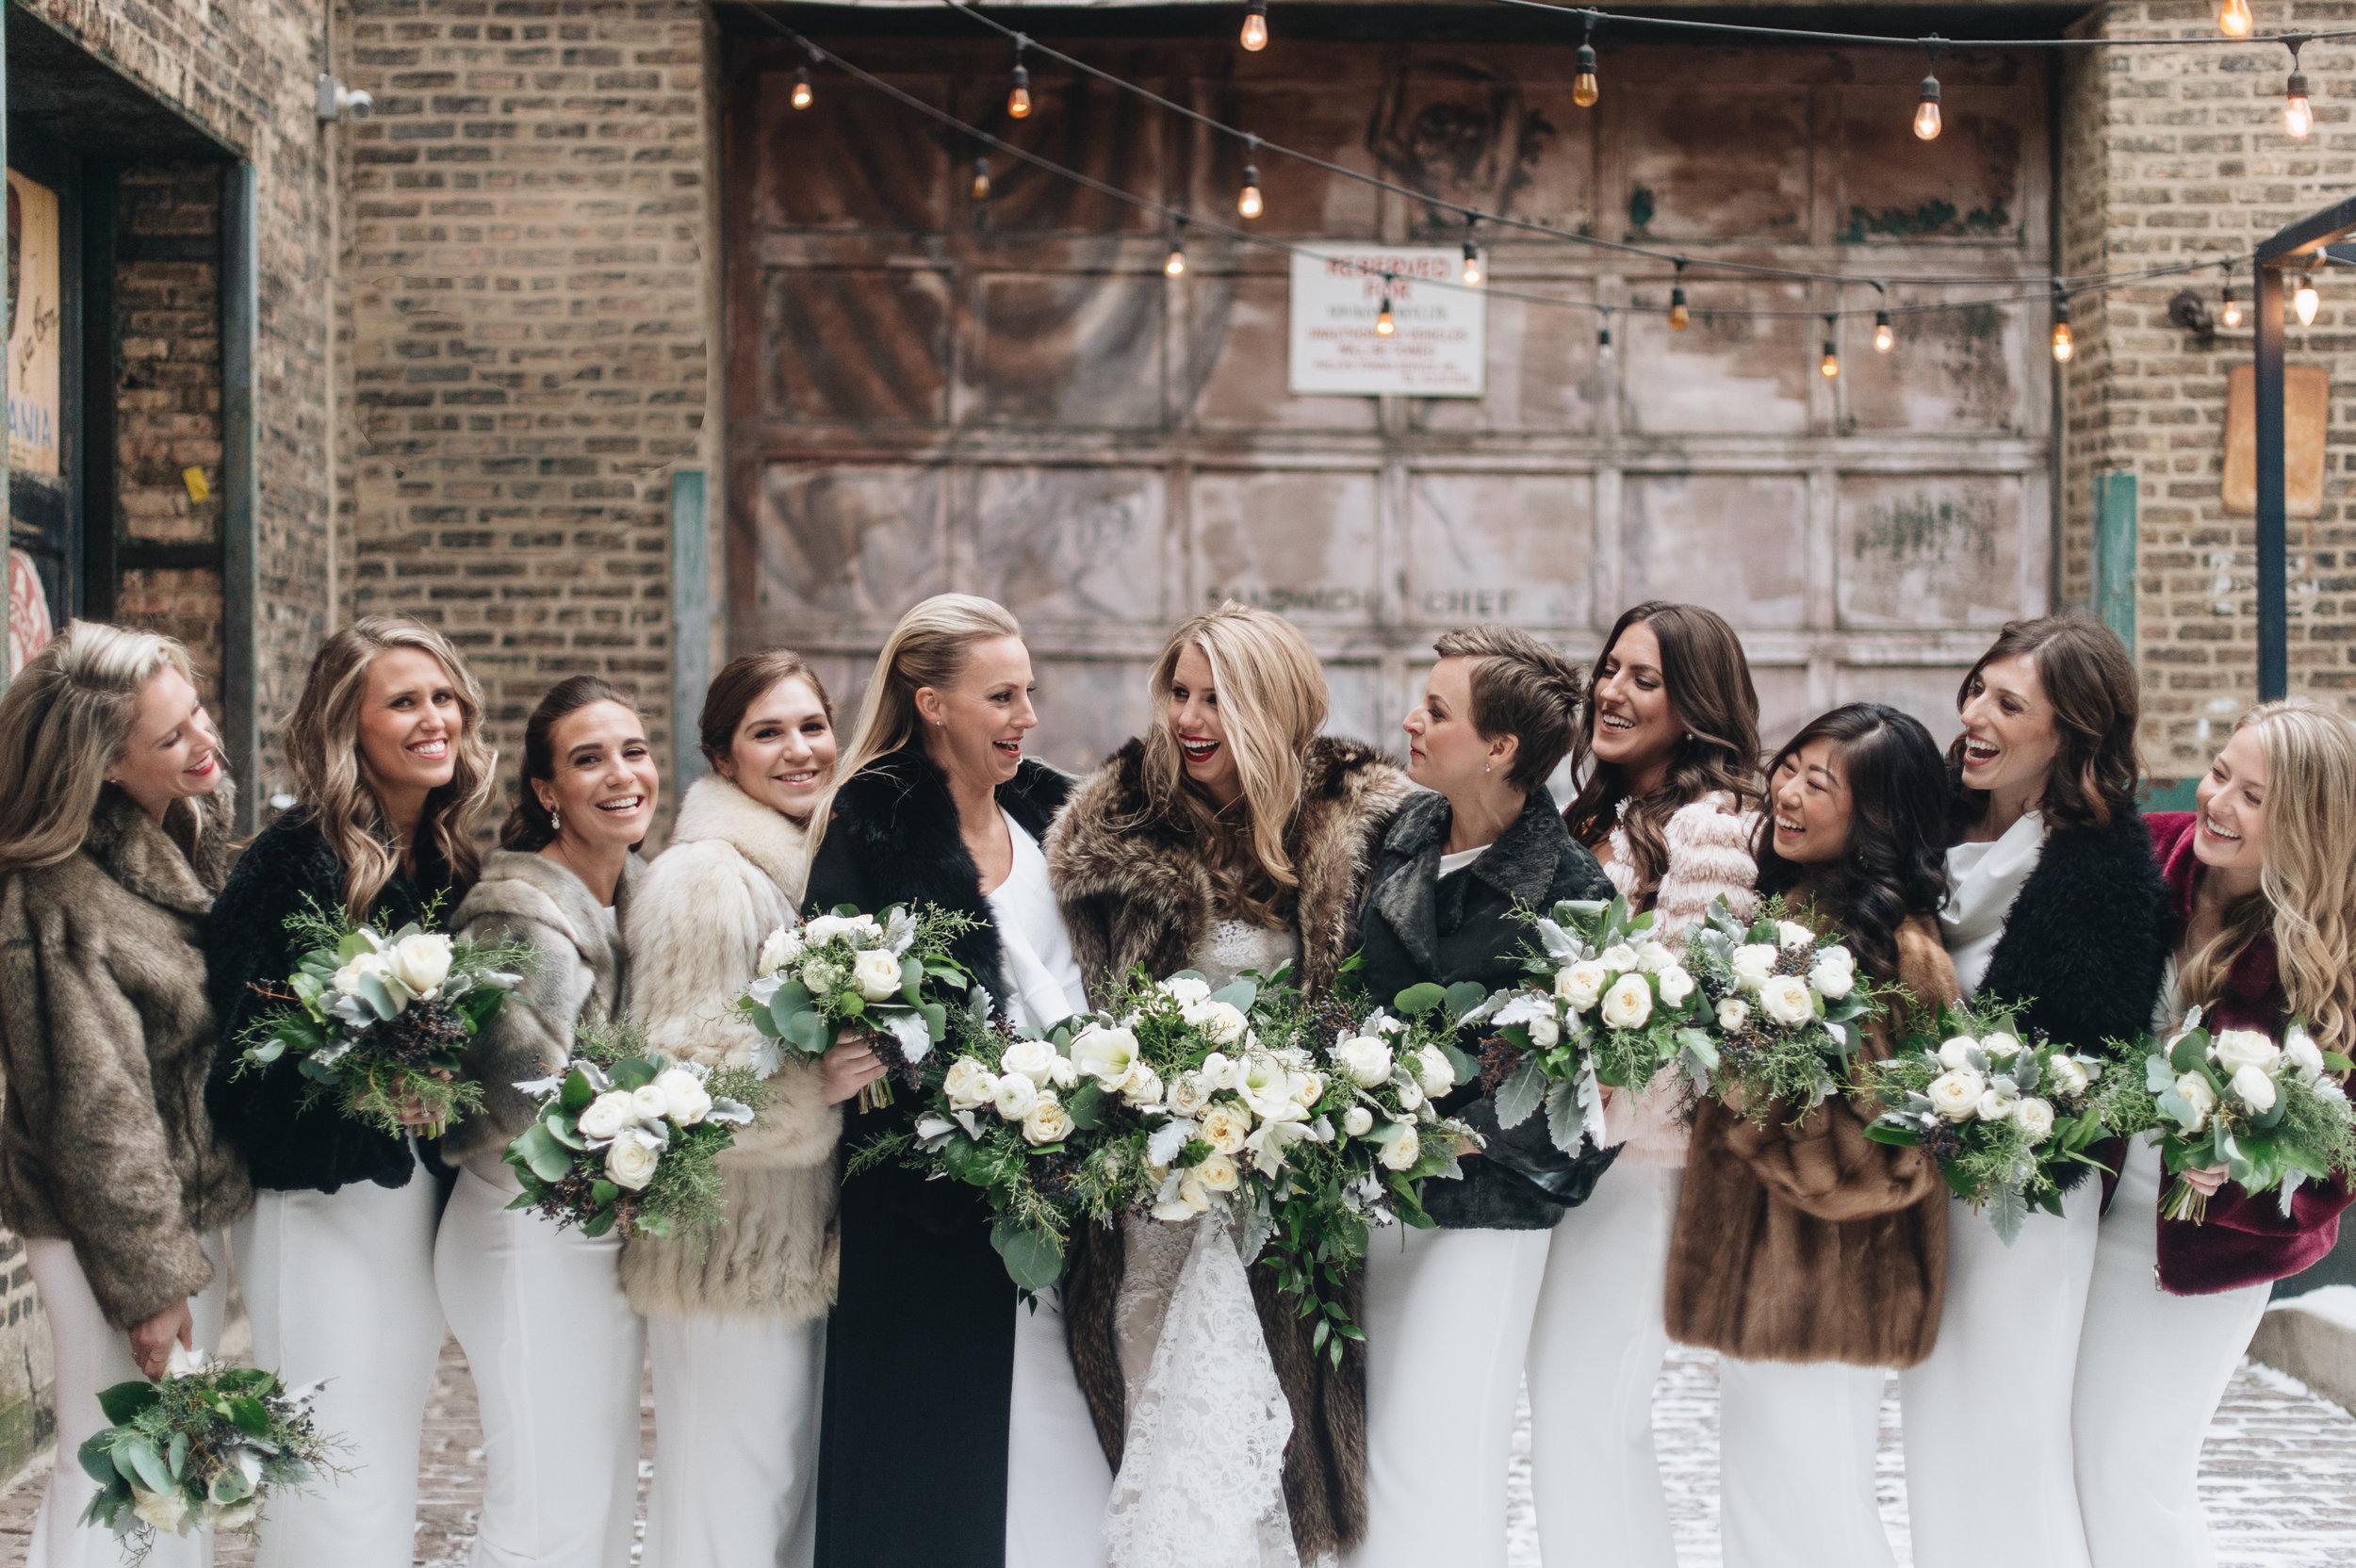 weddingparty-paperantler-0033.jpg